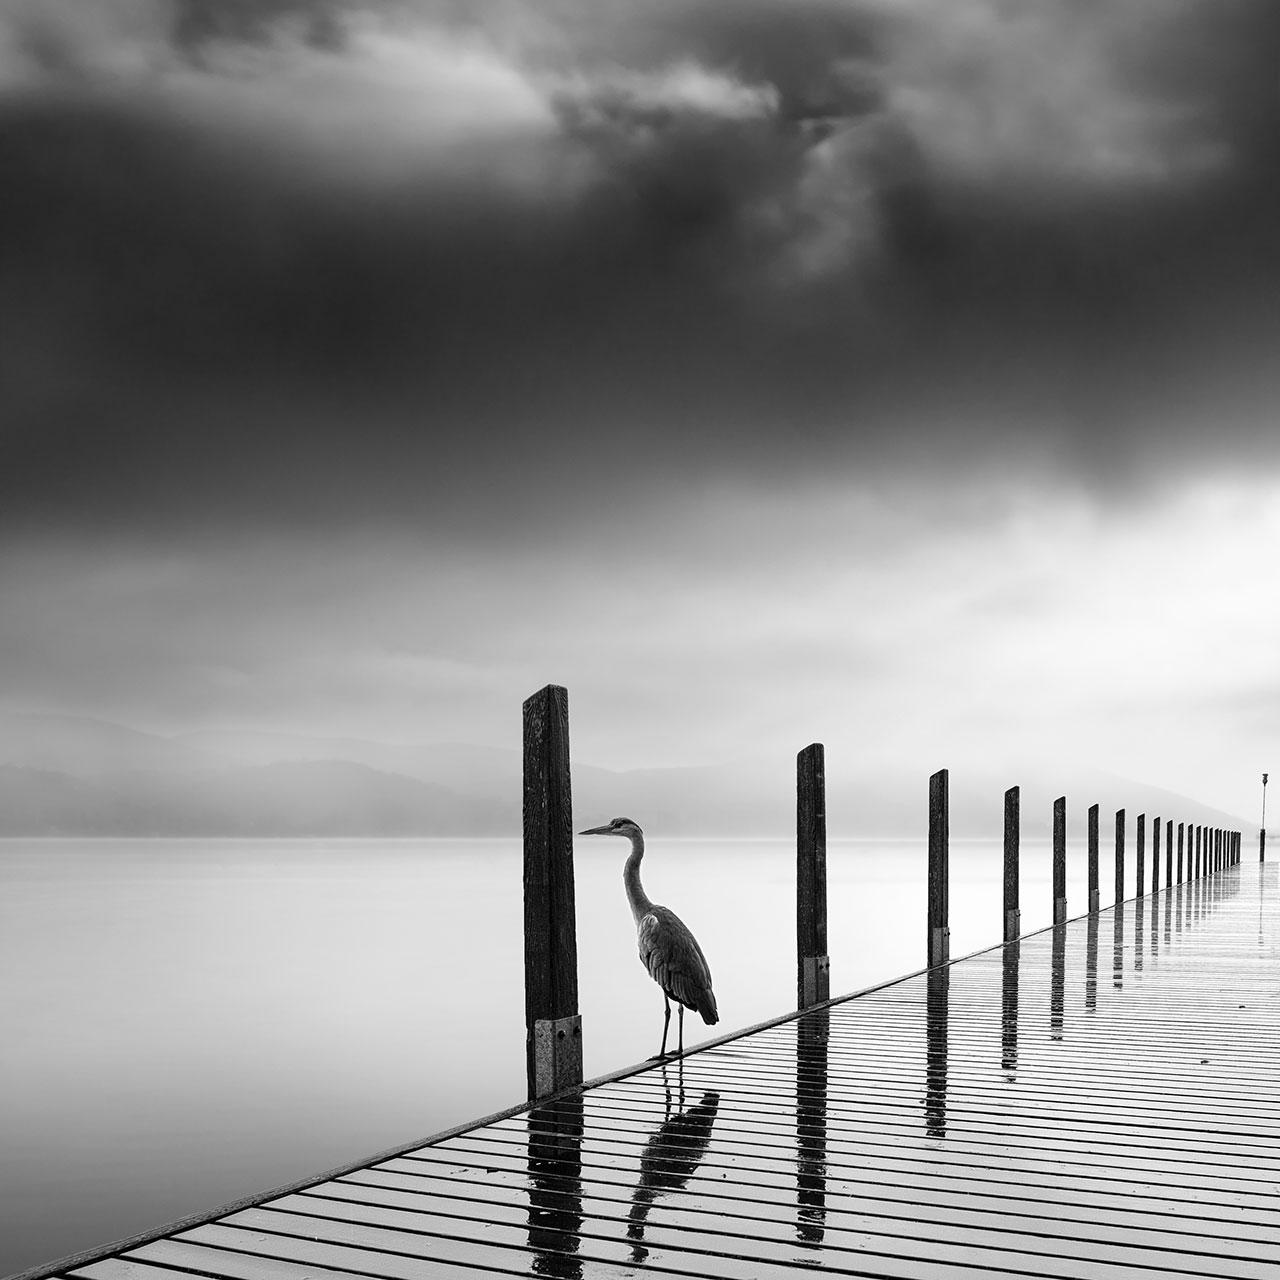 George Digalakis,Rain bird. ©George Digalakis.